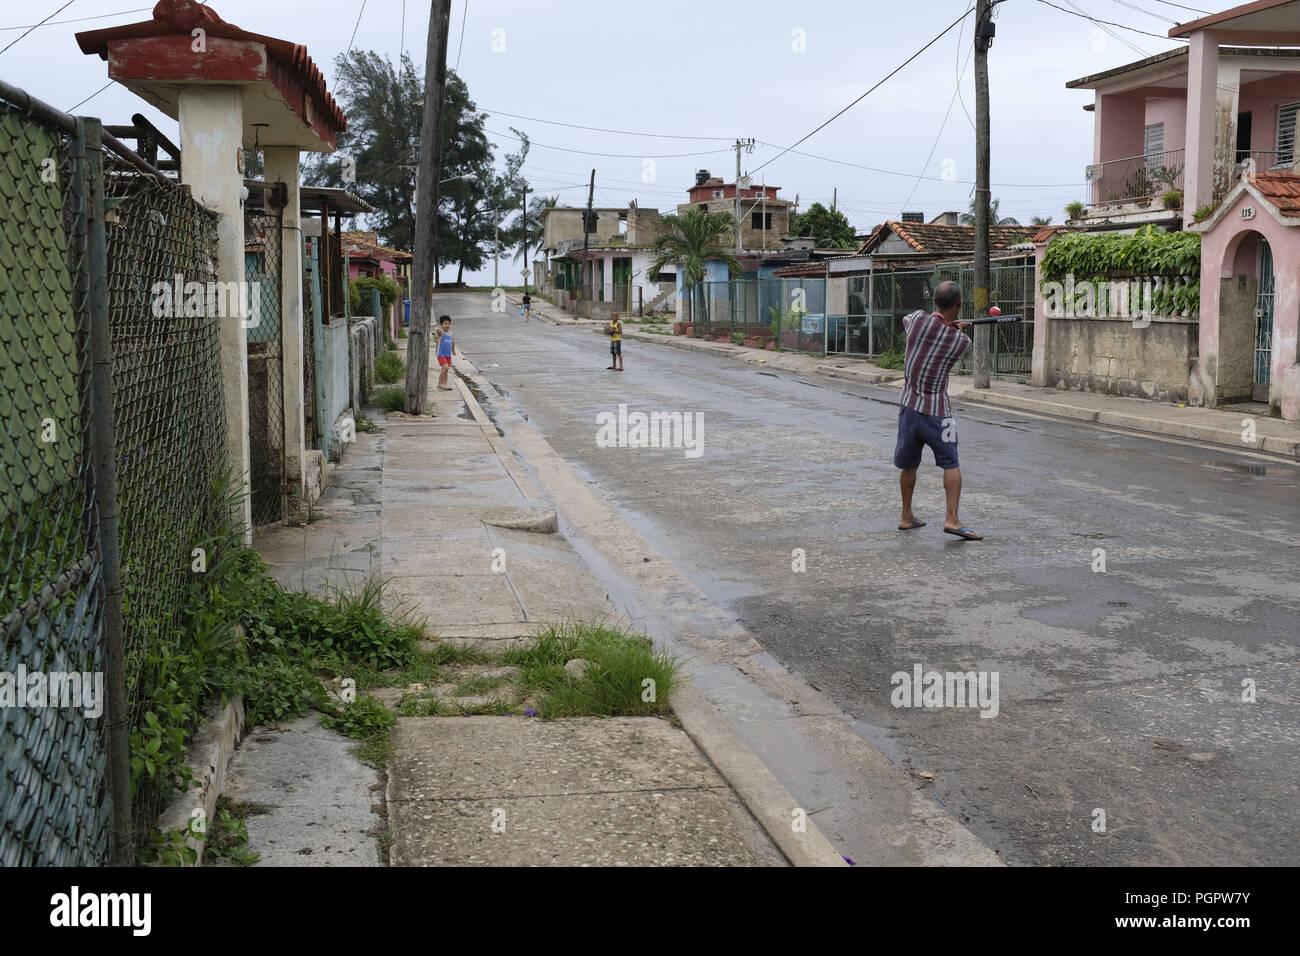 Havana, Cuba  18th June, 2017  Amongst all the changes